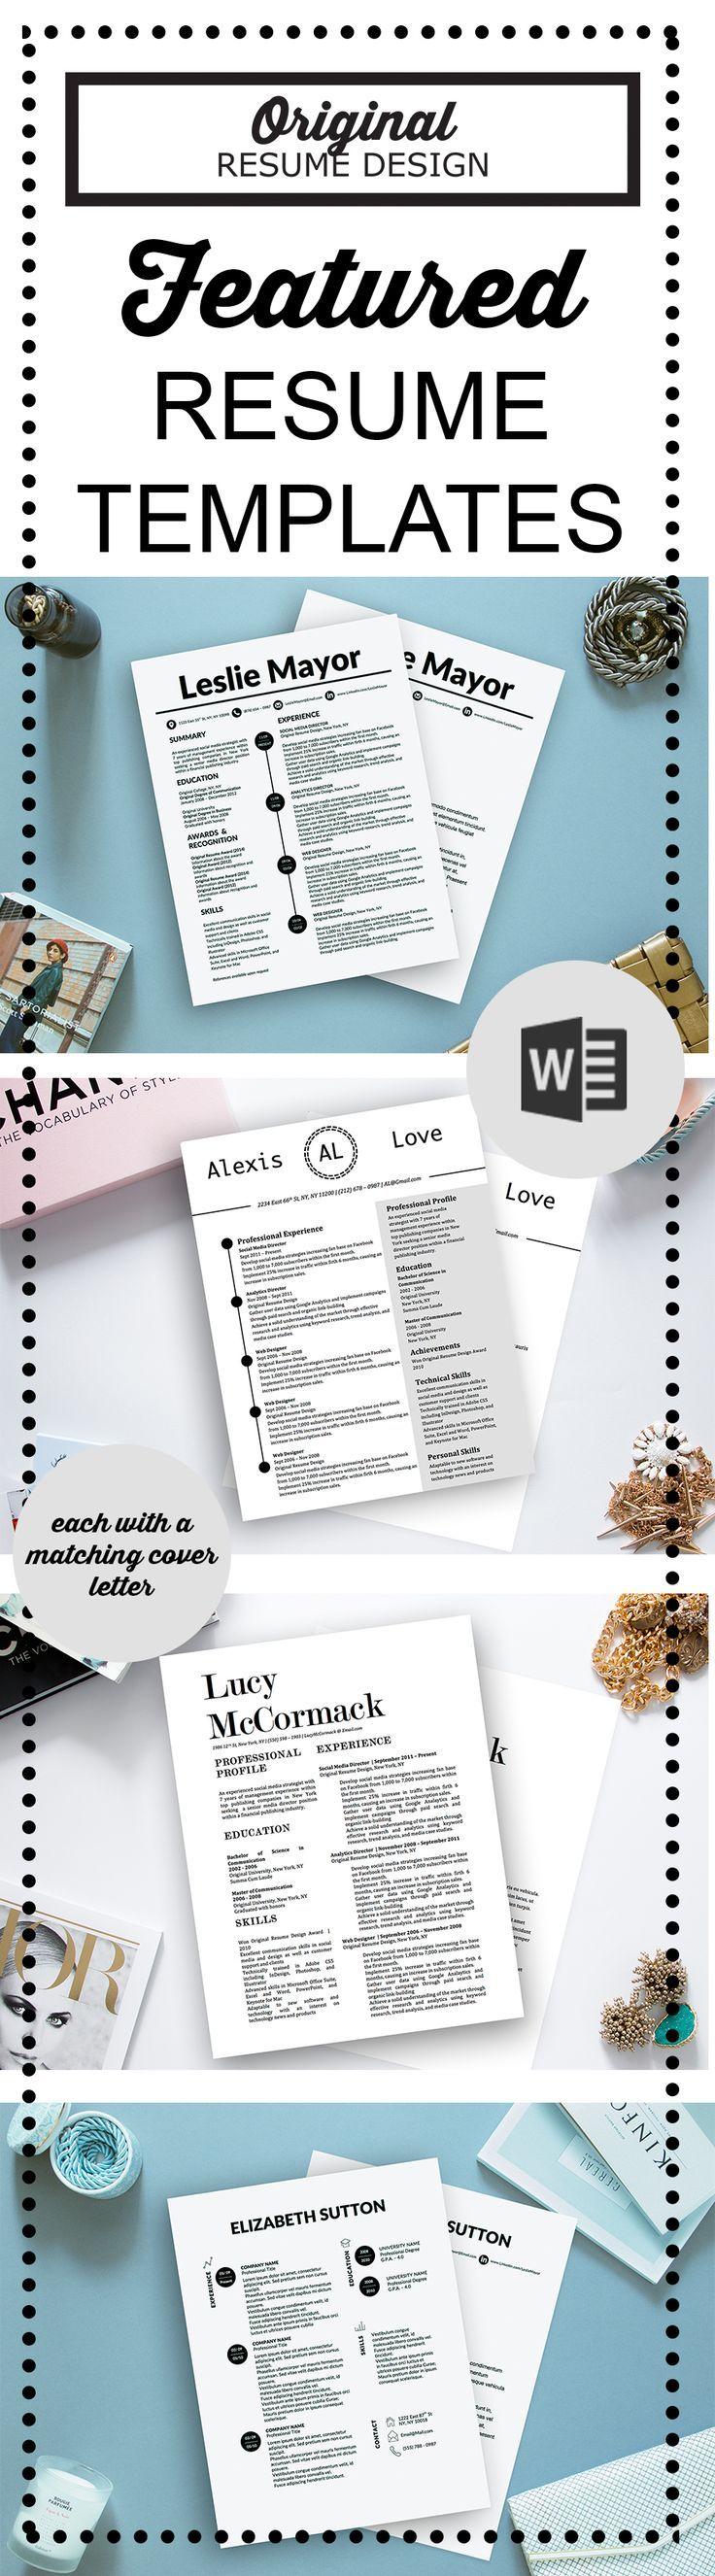 Featured Resume Templates Resume Tips Resume Design Job Resume